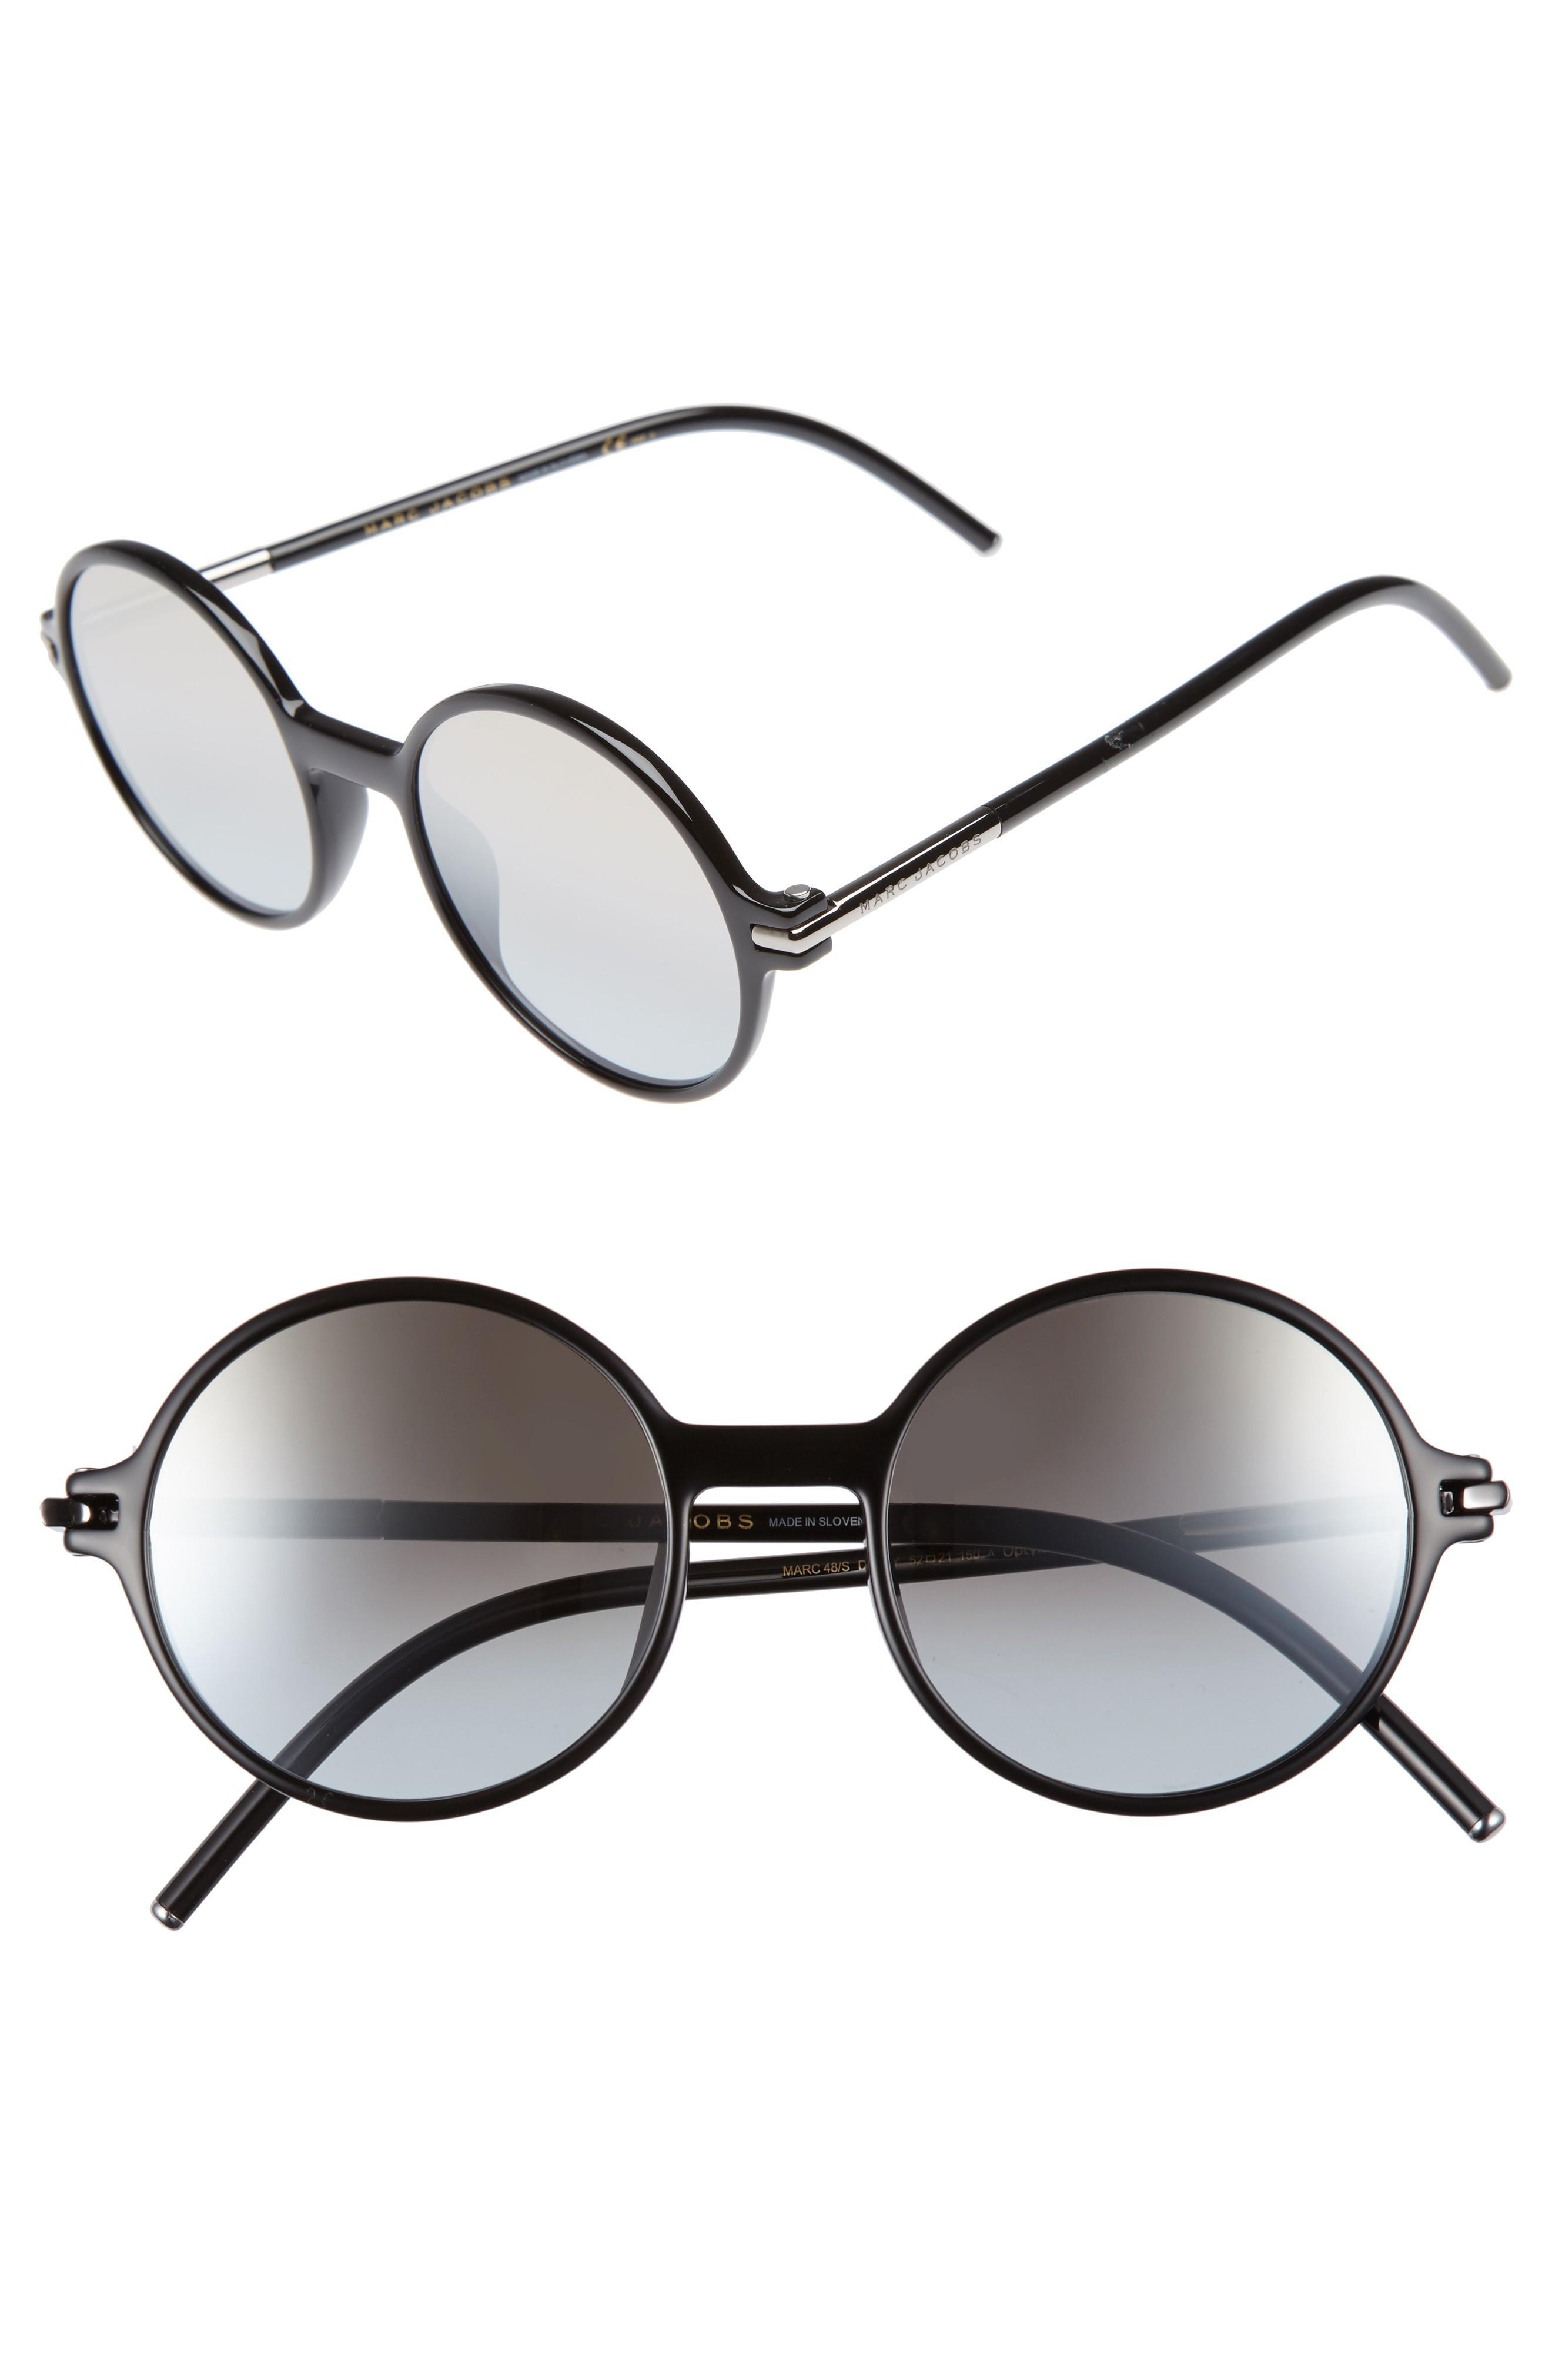 3713a662a13e Marc Jacobs 52Mm Round Sunglasses - Black/ Brown/ Gold Mirror | ModeSens